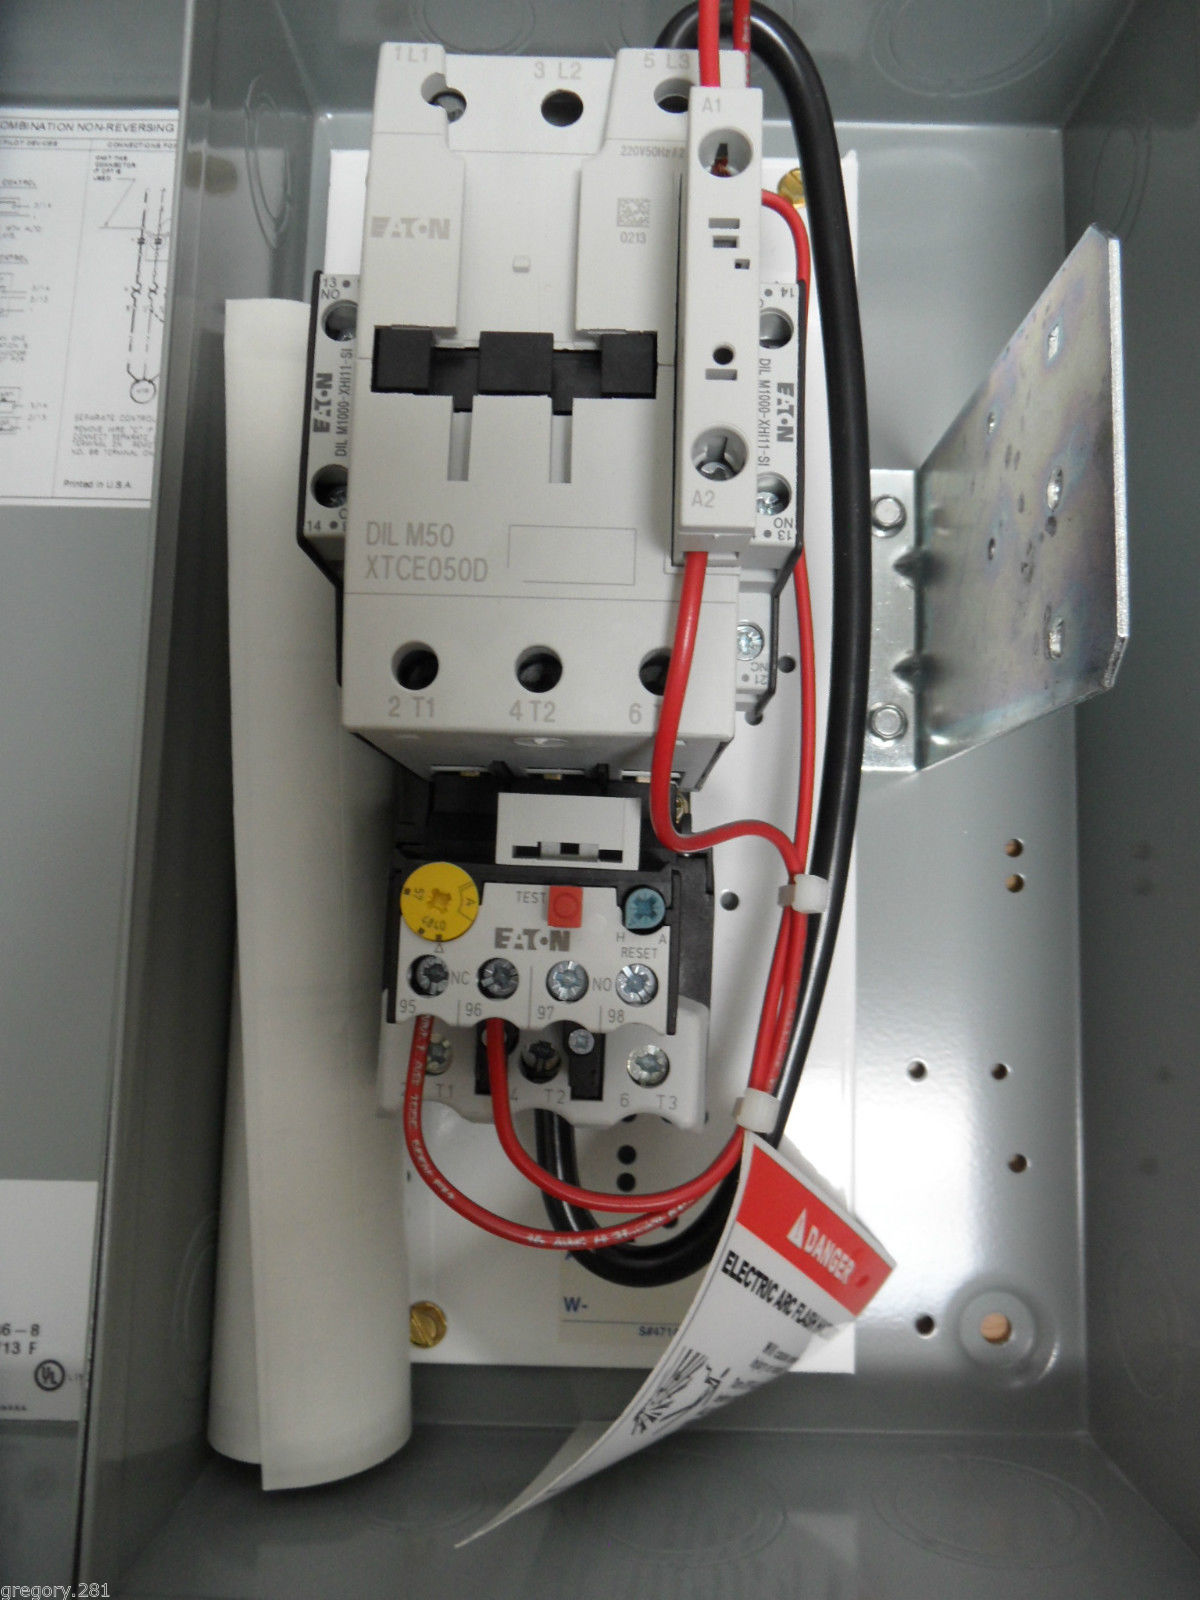 eaton fvnr starter wiring diagram motor soft starter circuitcircuit eaton ecx09k1baa qa27s29 non combination iec fvnr [ 1200 x 1600 Pixel ]